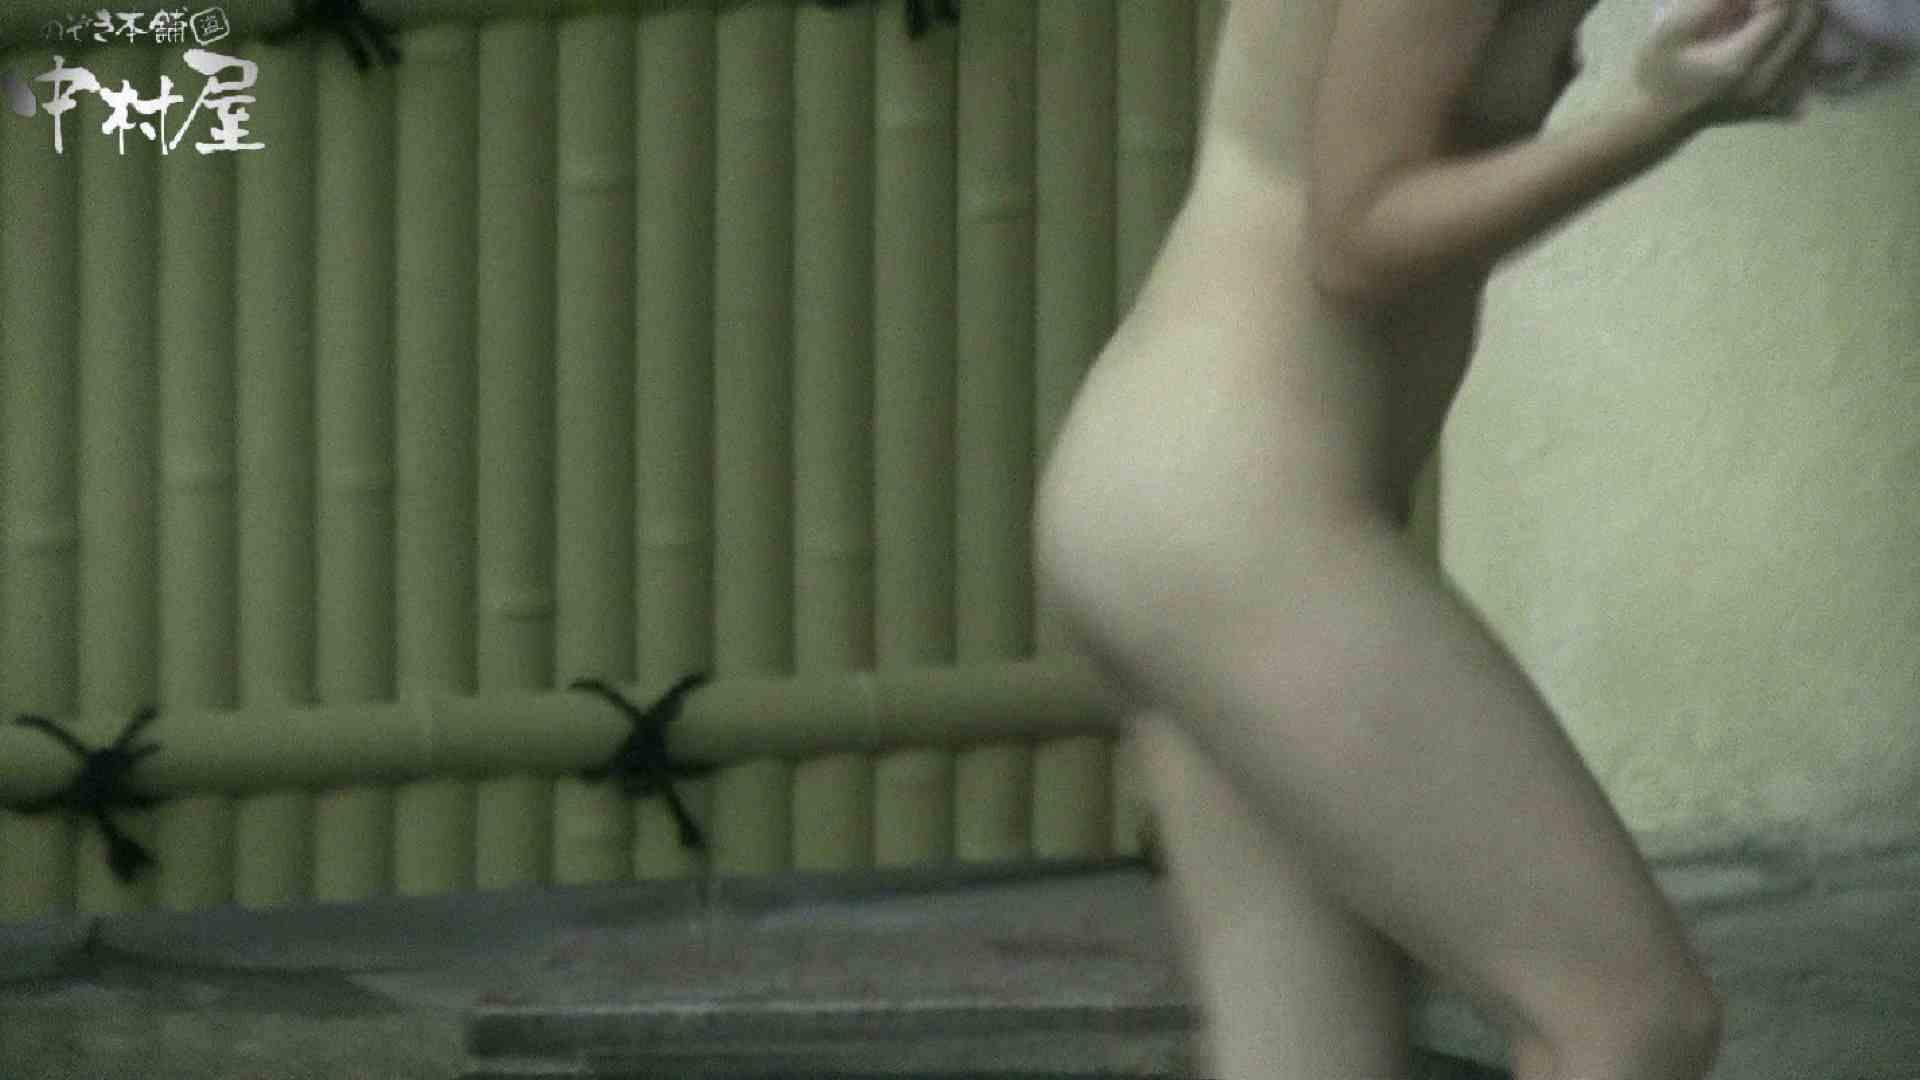 Aquaな露天風呂Vol.904 美しいOLの裸体 オメコ動画キャプチャ 103pic 26